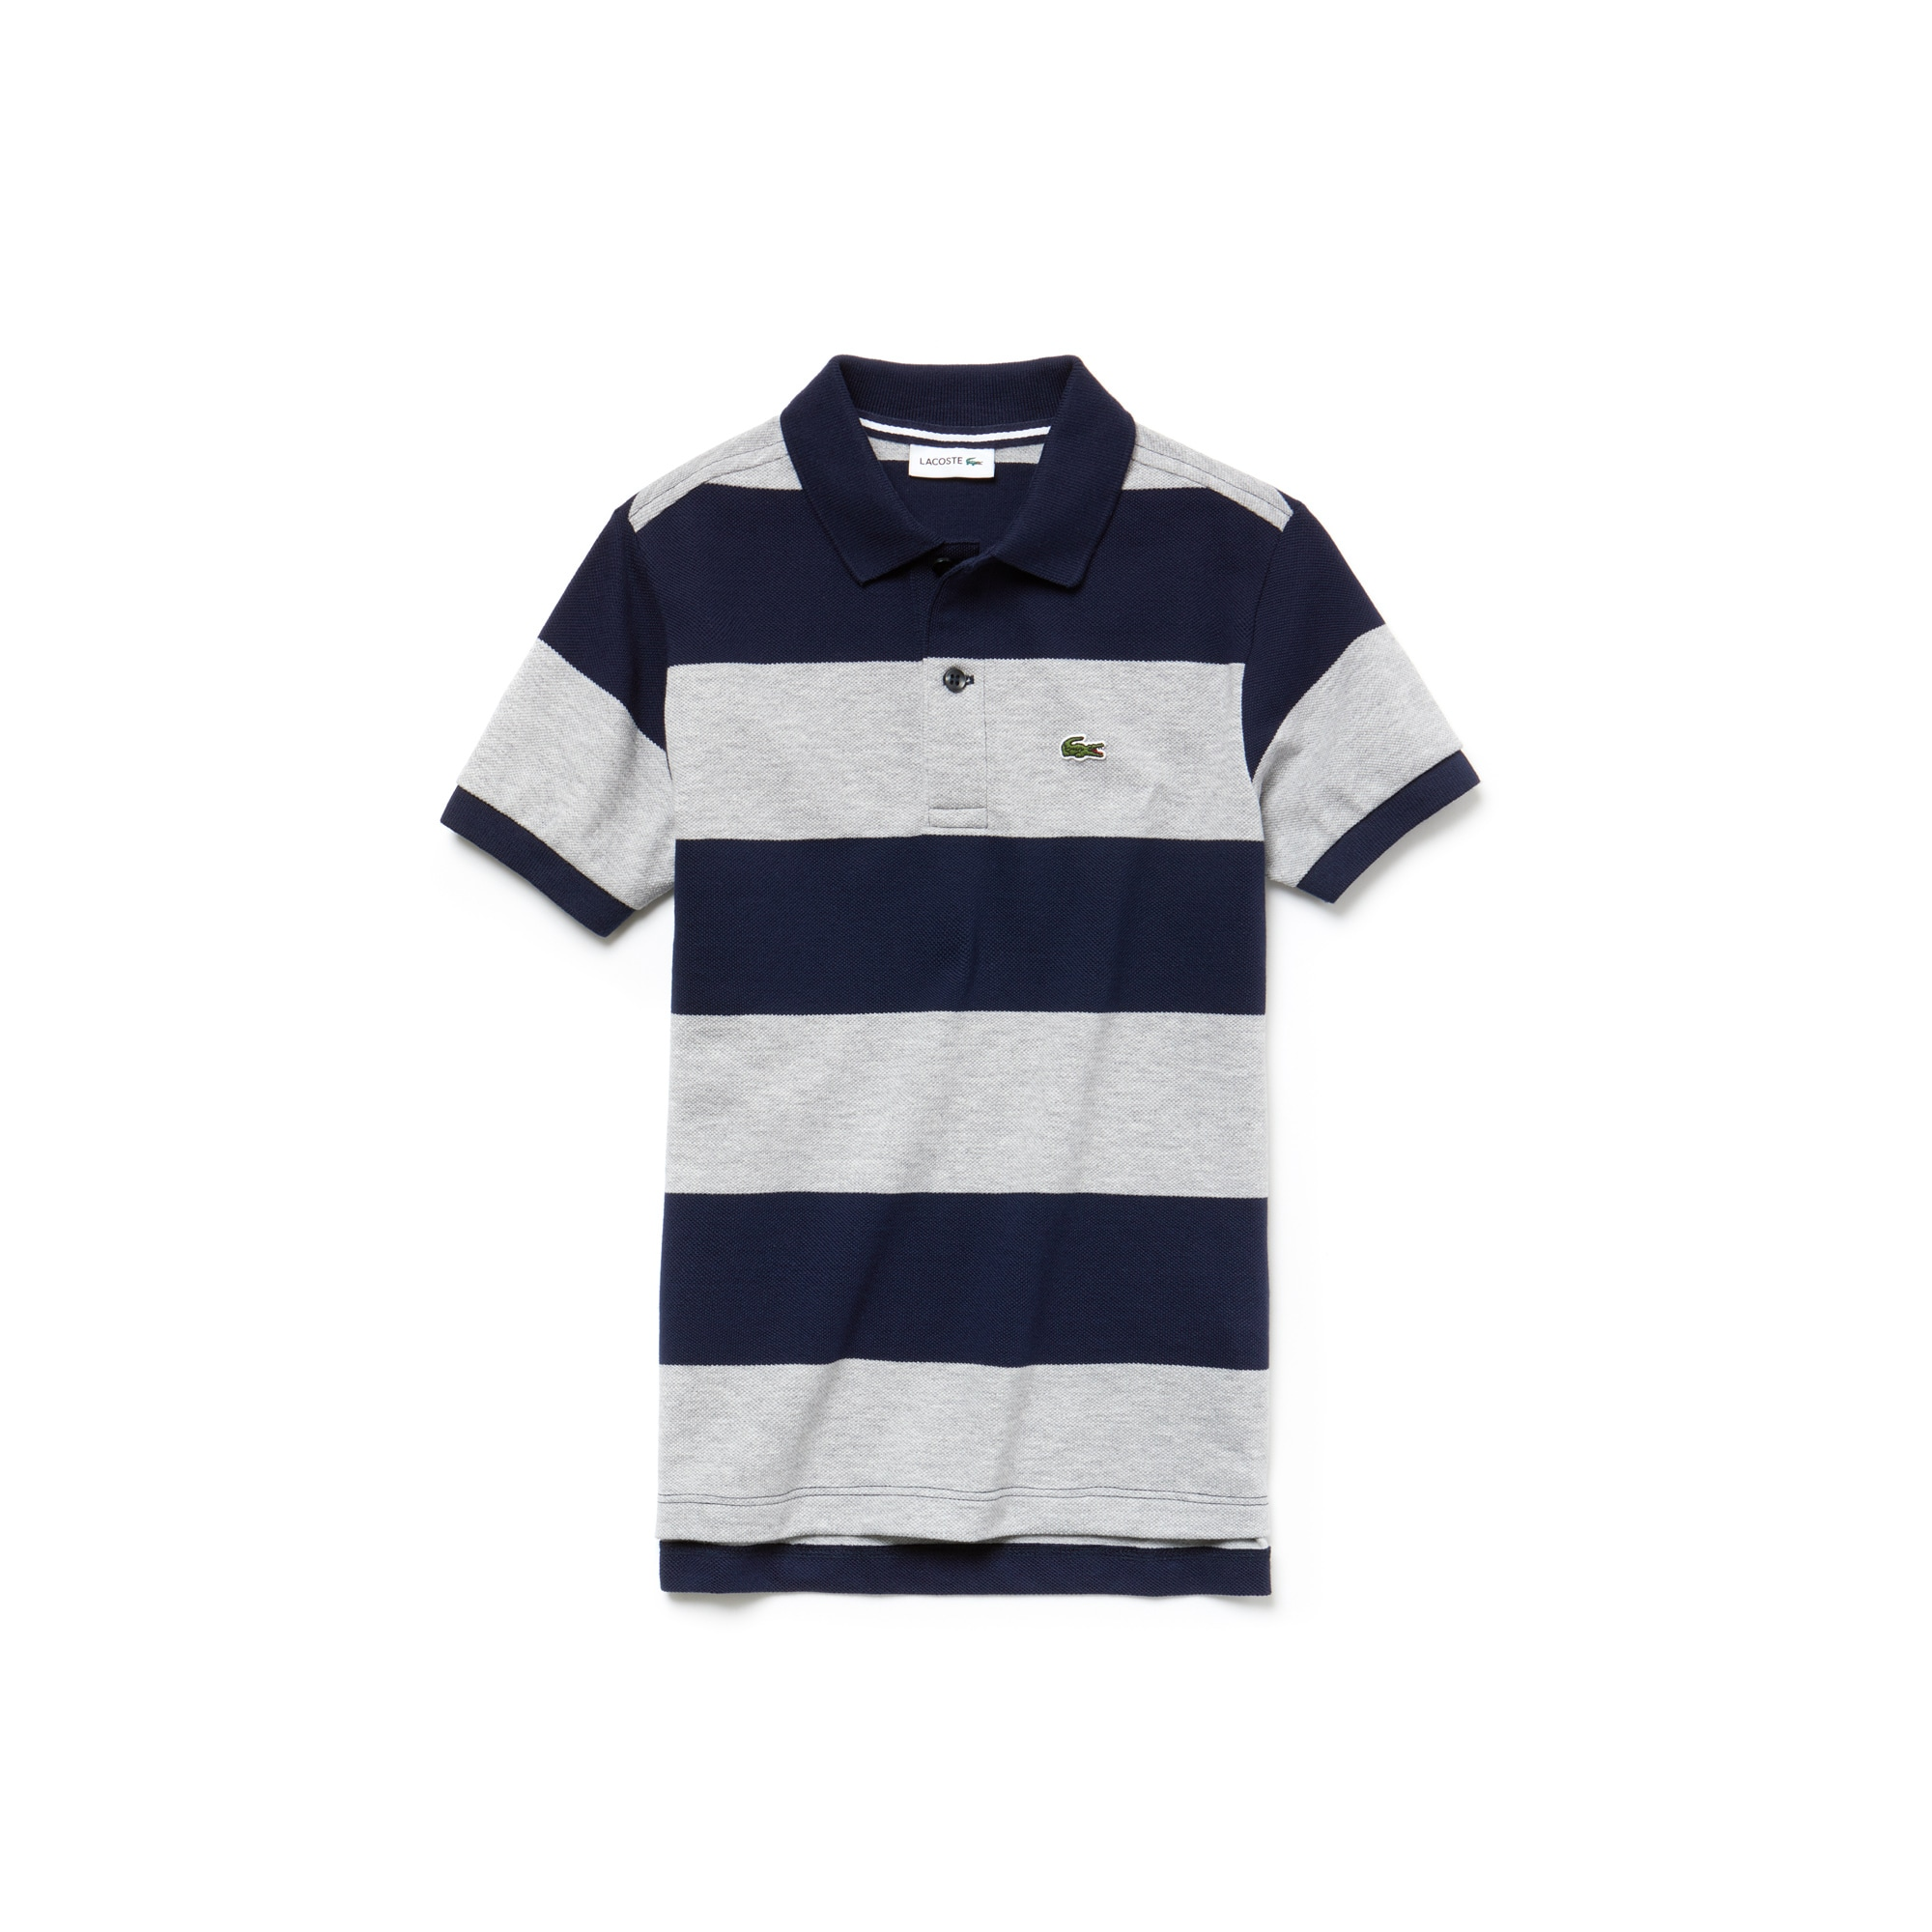 Boys'  Striped Cotton Petit Piqué Polo Shirt